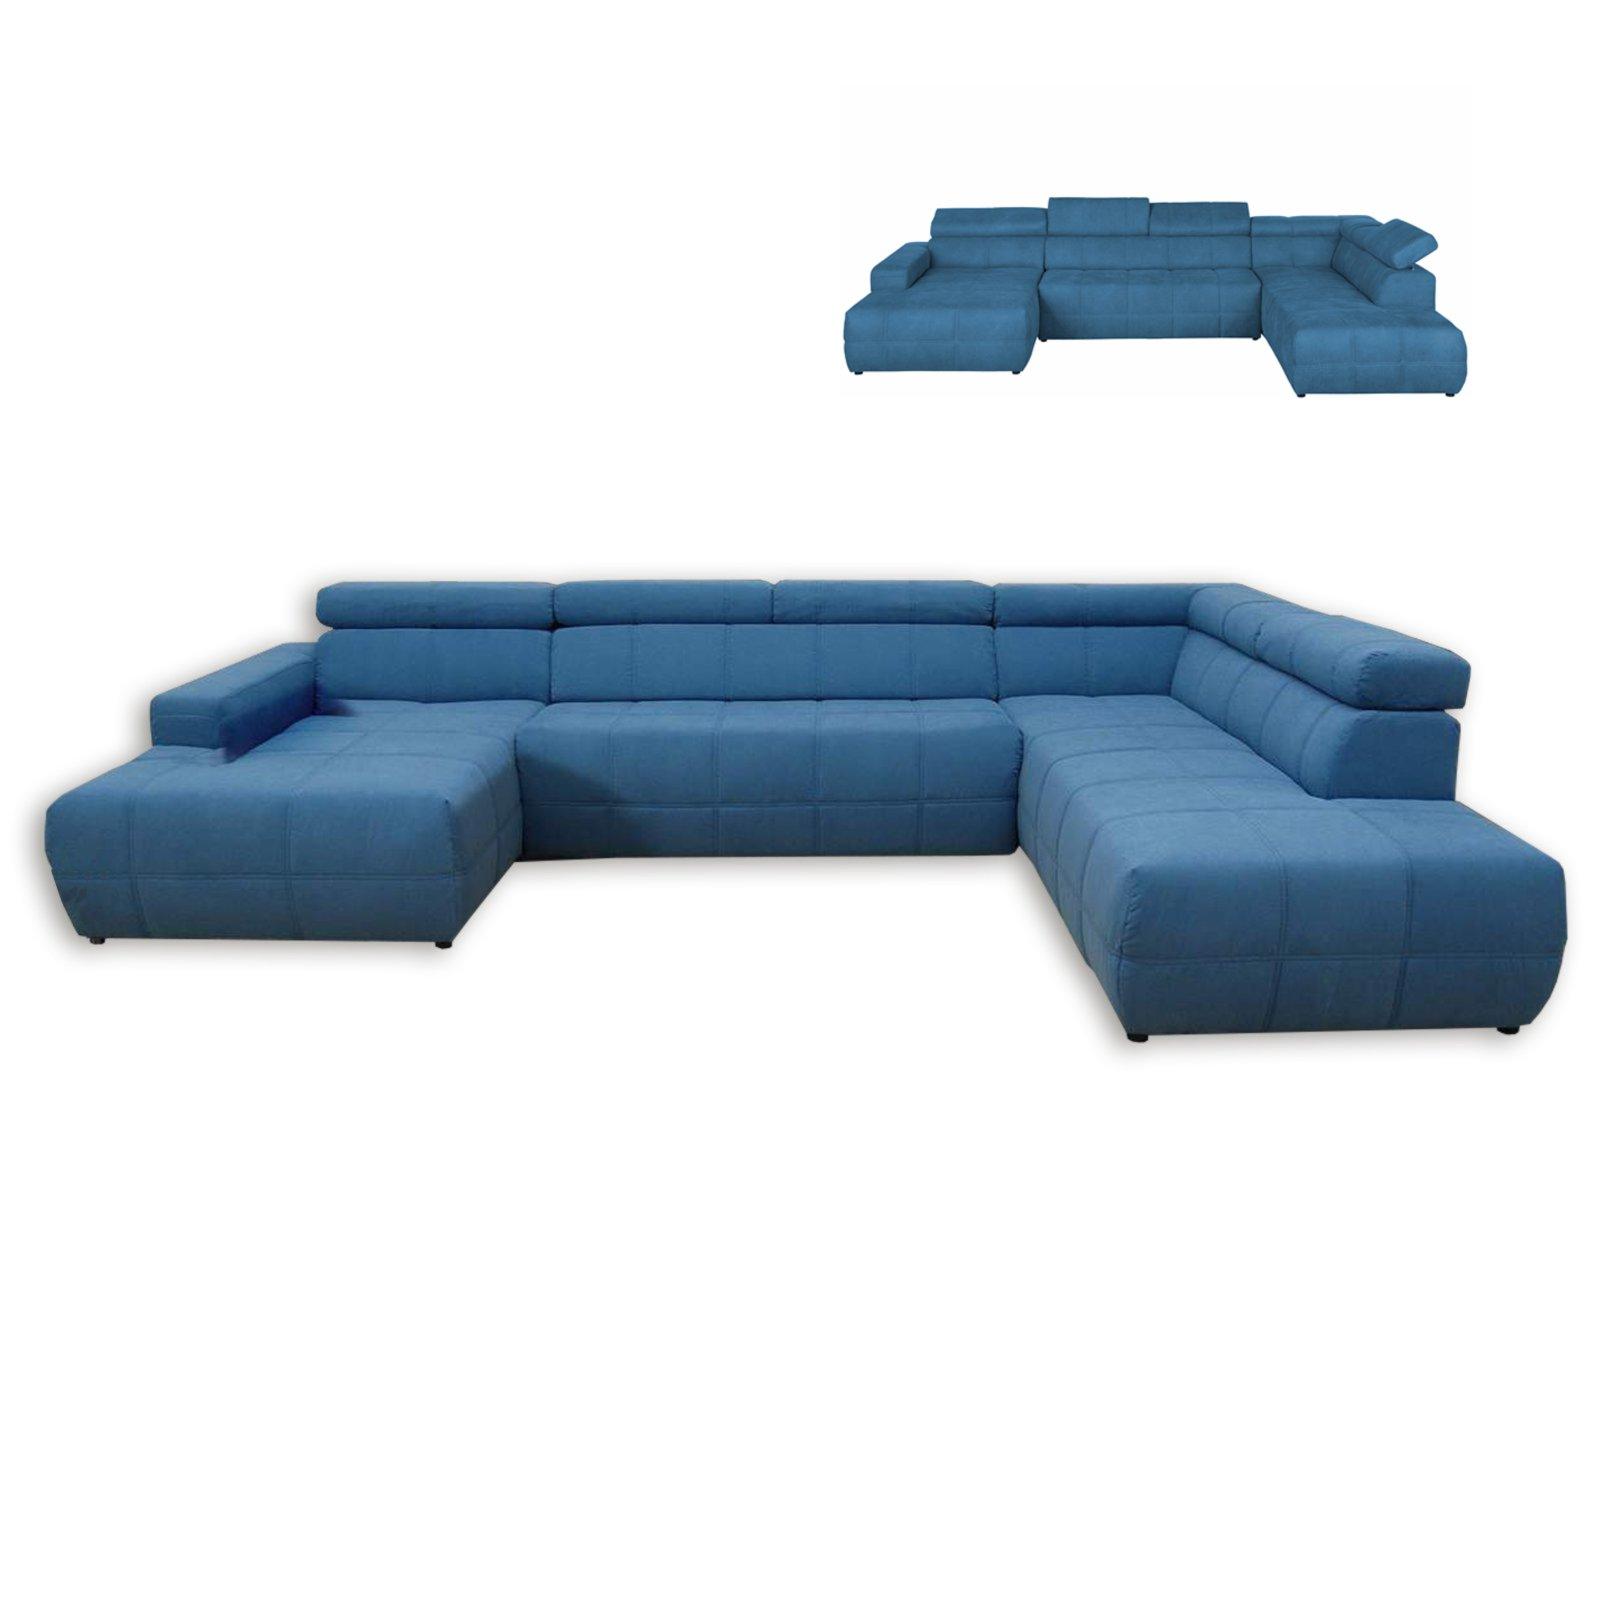 wohnlandschaft t rkis recamiere links mit funktionen wohnlandschaften u form sofas. Black Bedroom Furniture Sets. Home Design Ideas